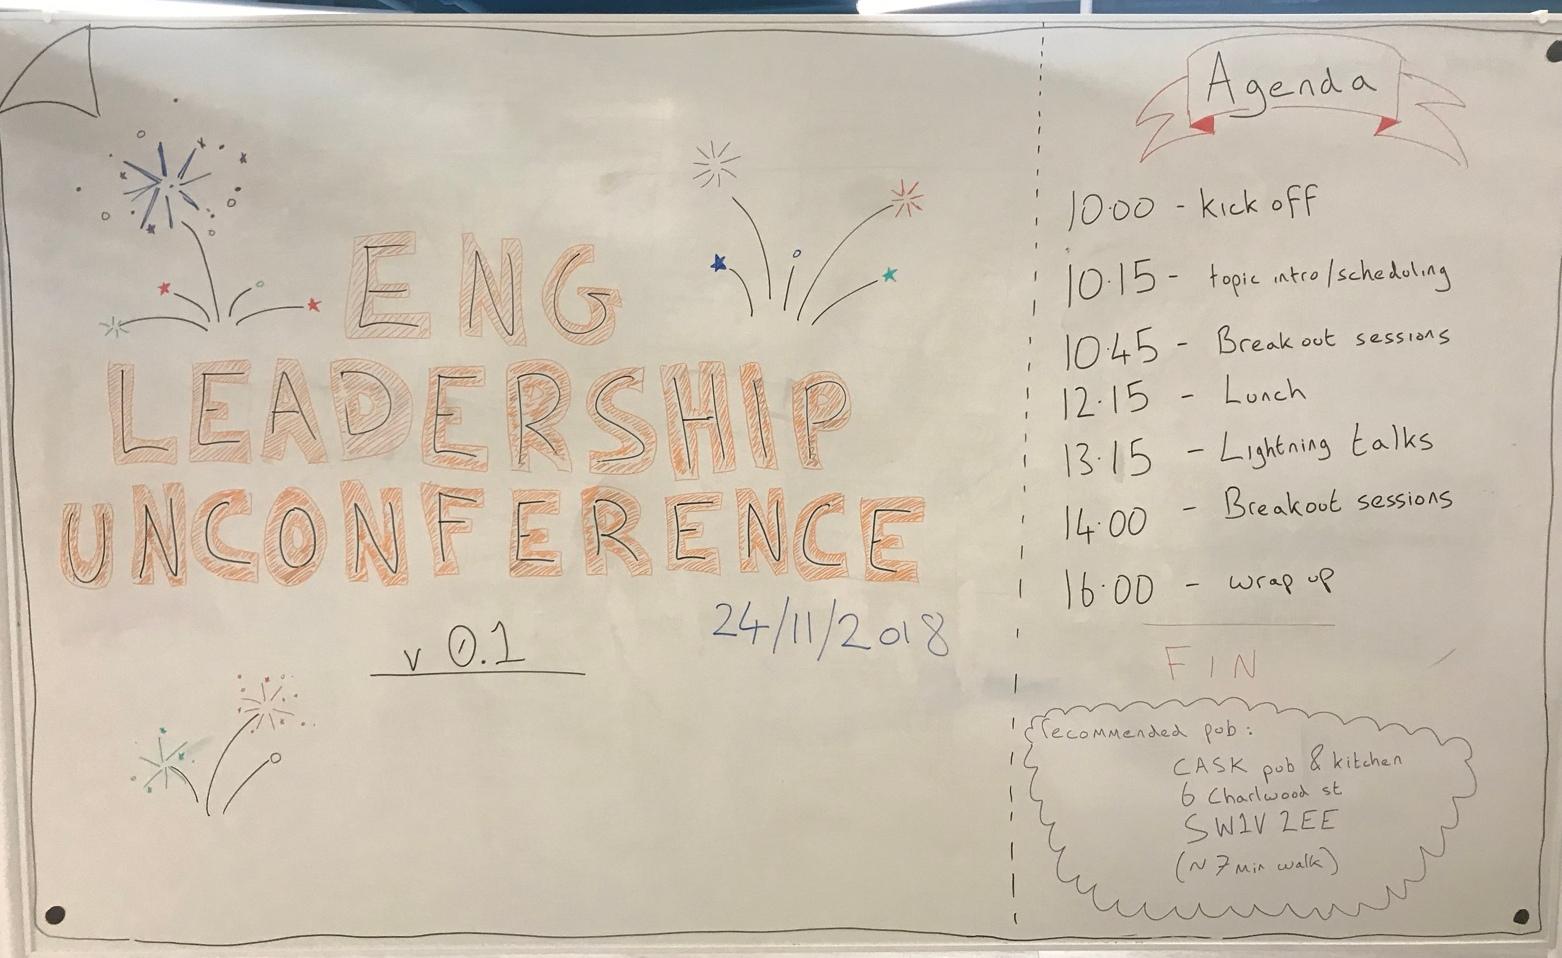 Engineering Leadership Unconference